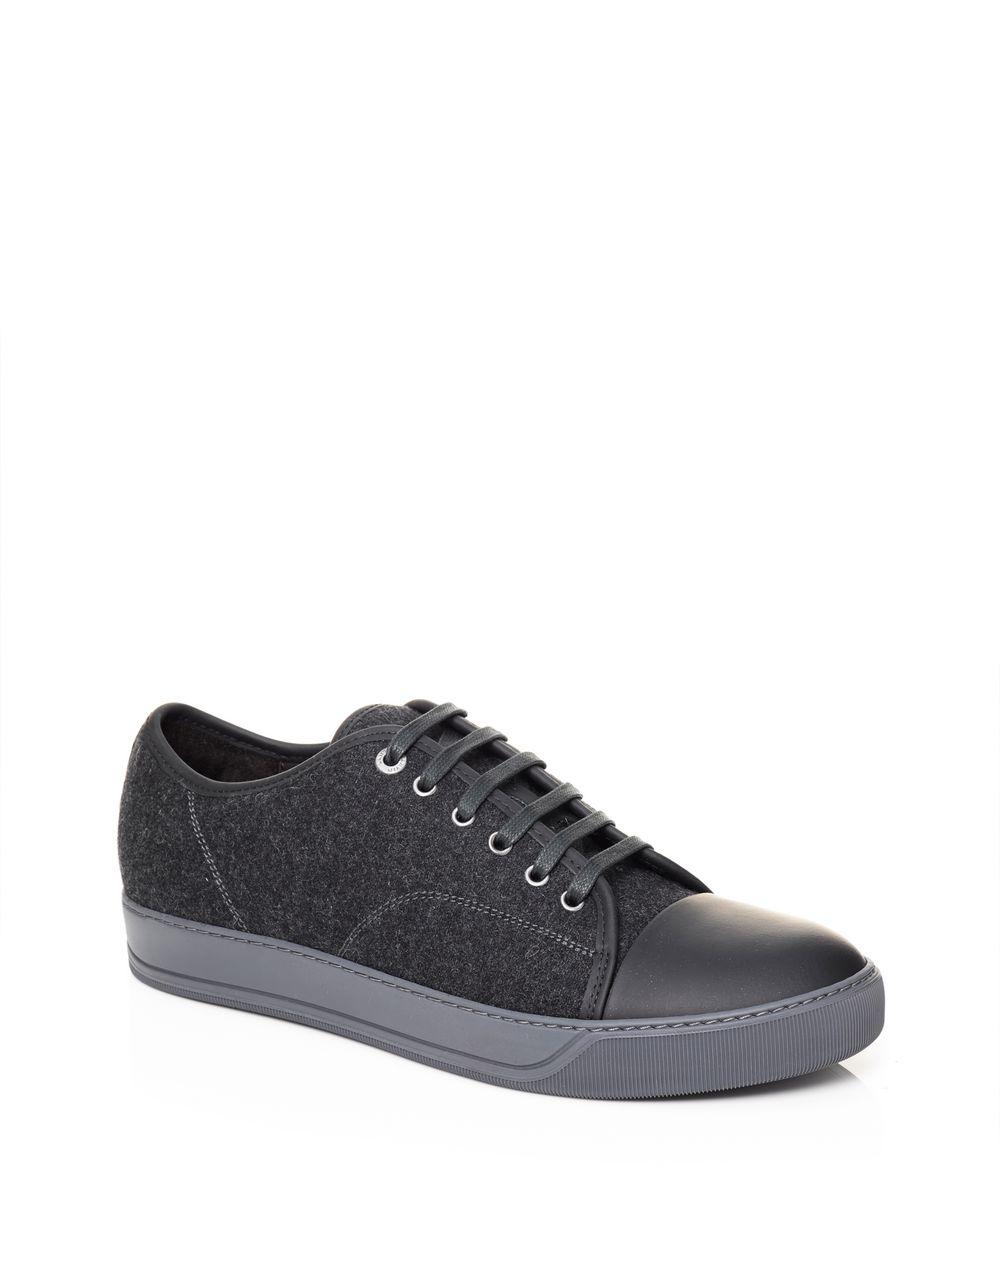 LanvinDbb1 sneakers WLO1Sd4Sb